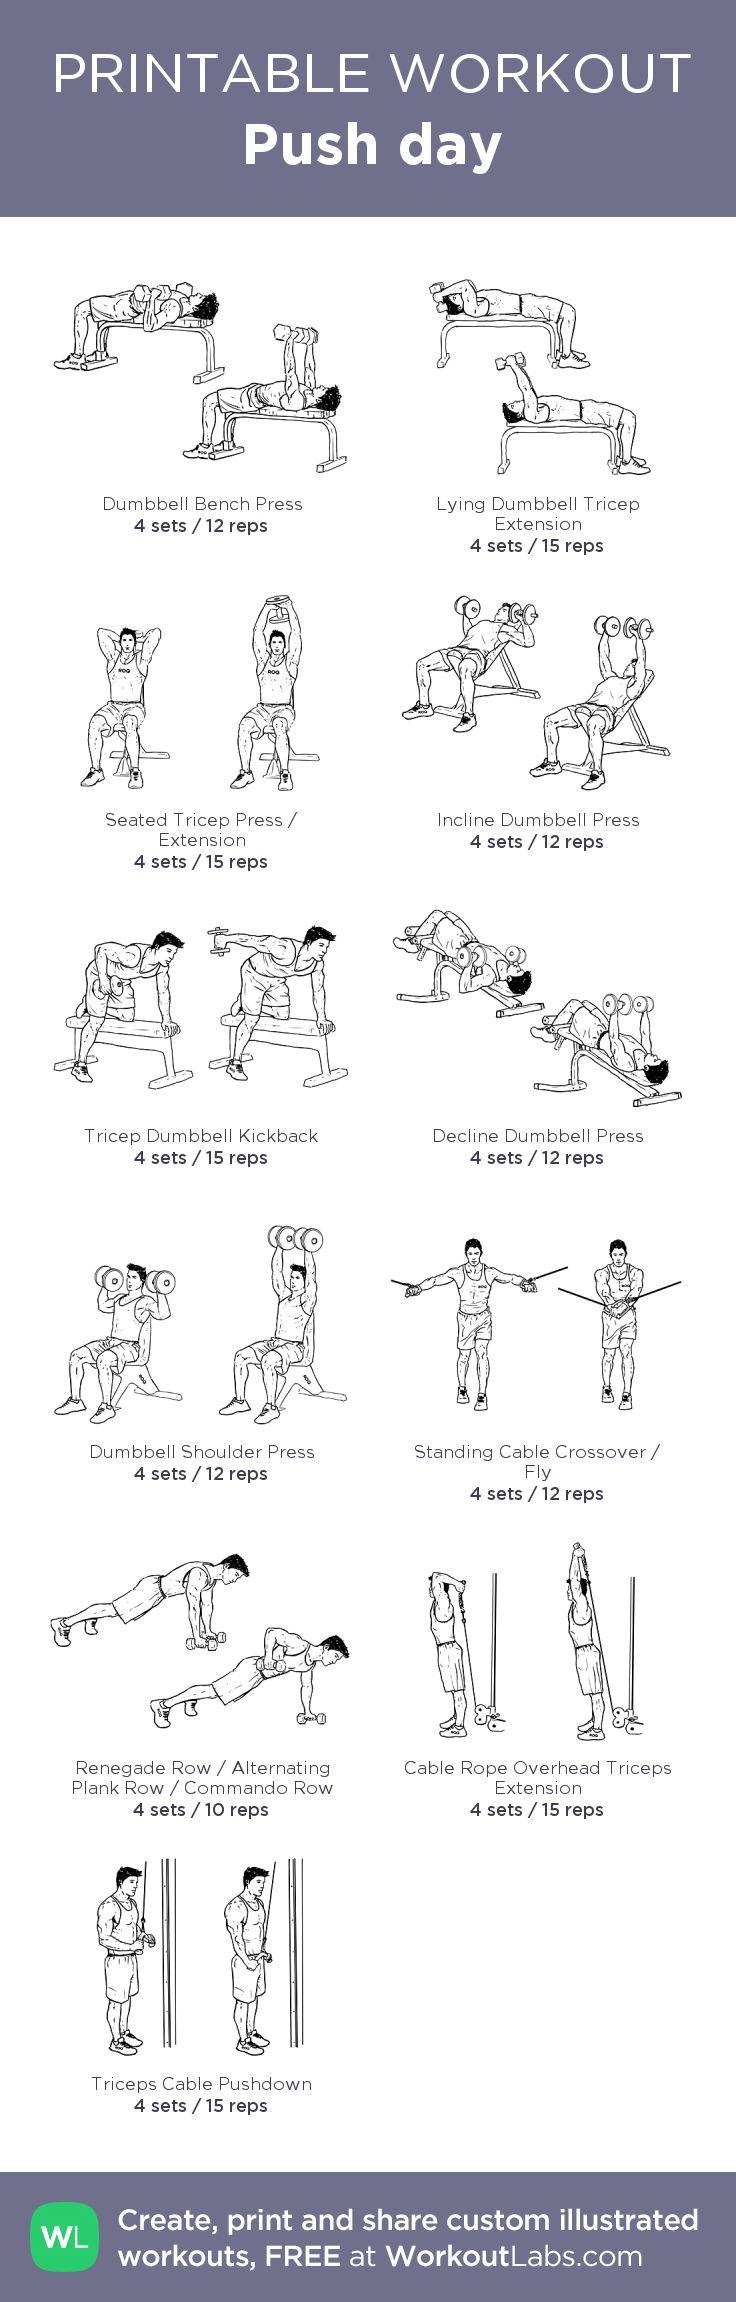 Push day: my custom printable workout by @WorkoutLabs #workoutlabs #customworkout